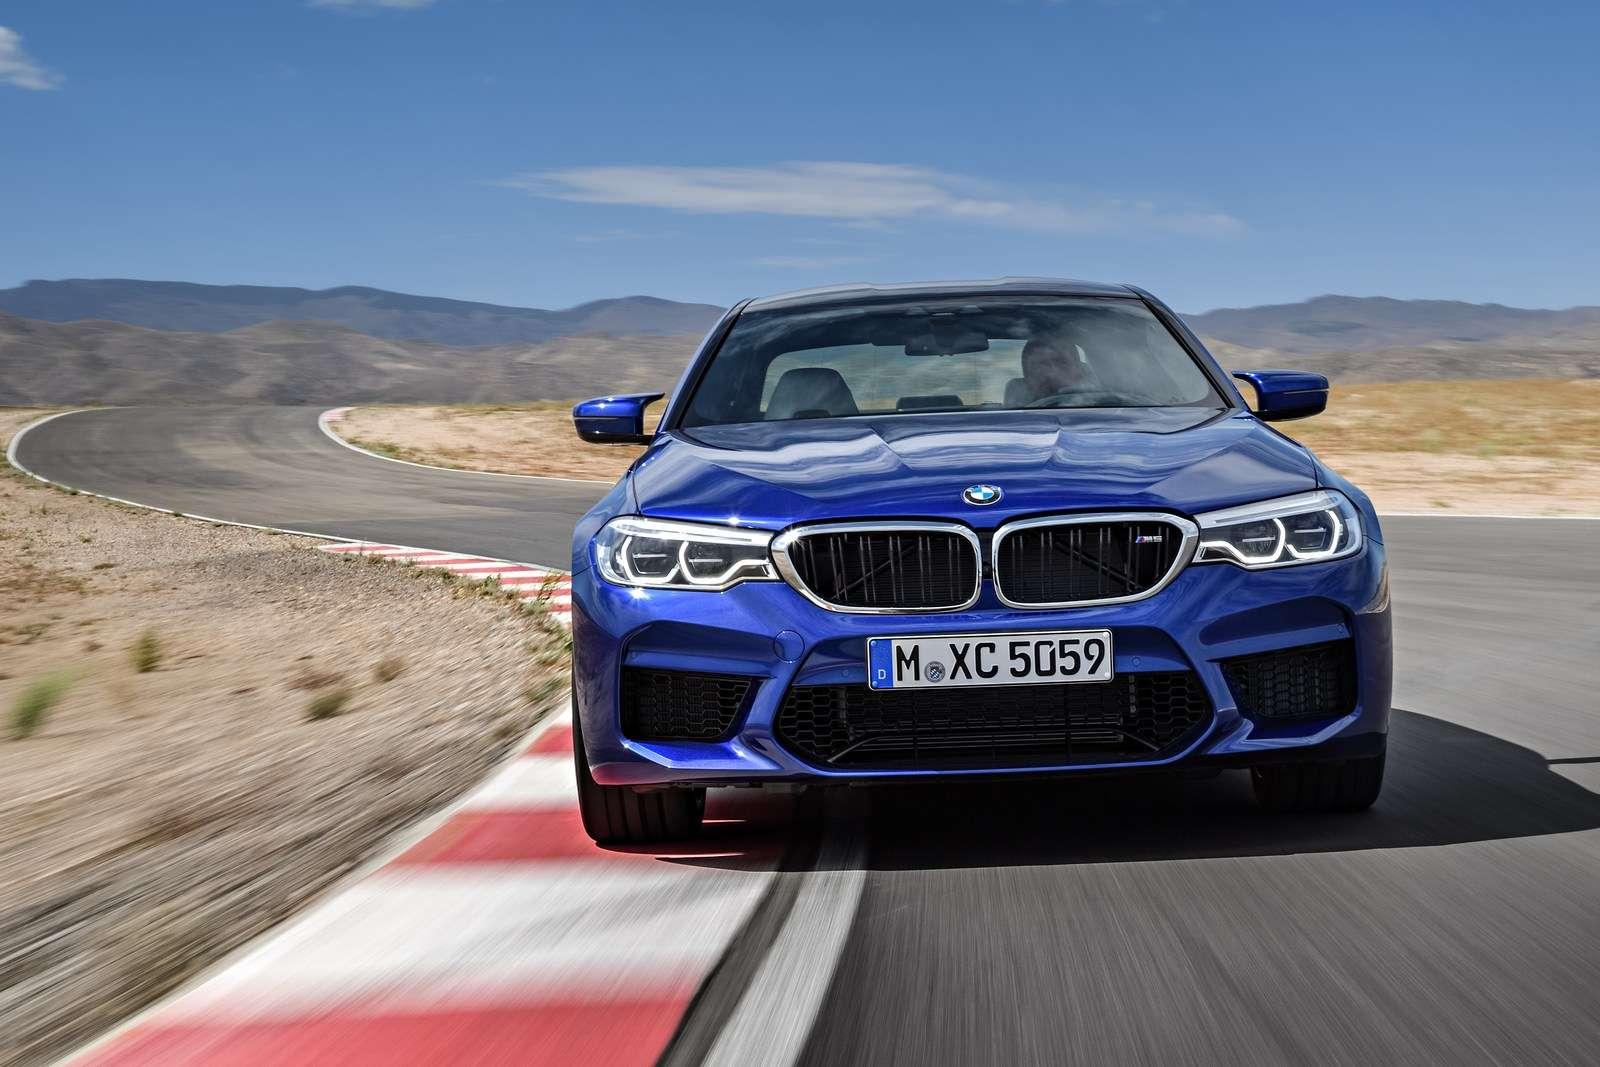 Видео-обзор BMW M5 (F90) Competition 2018